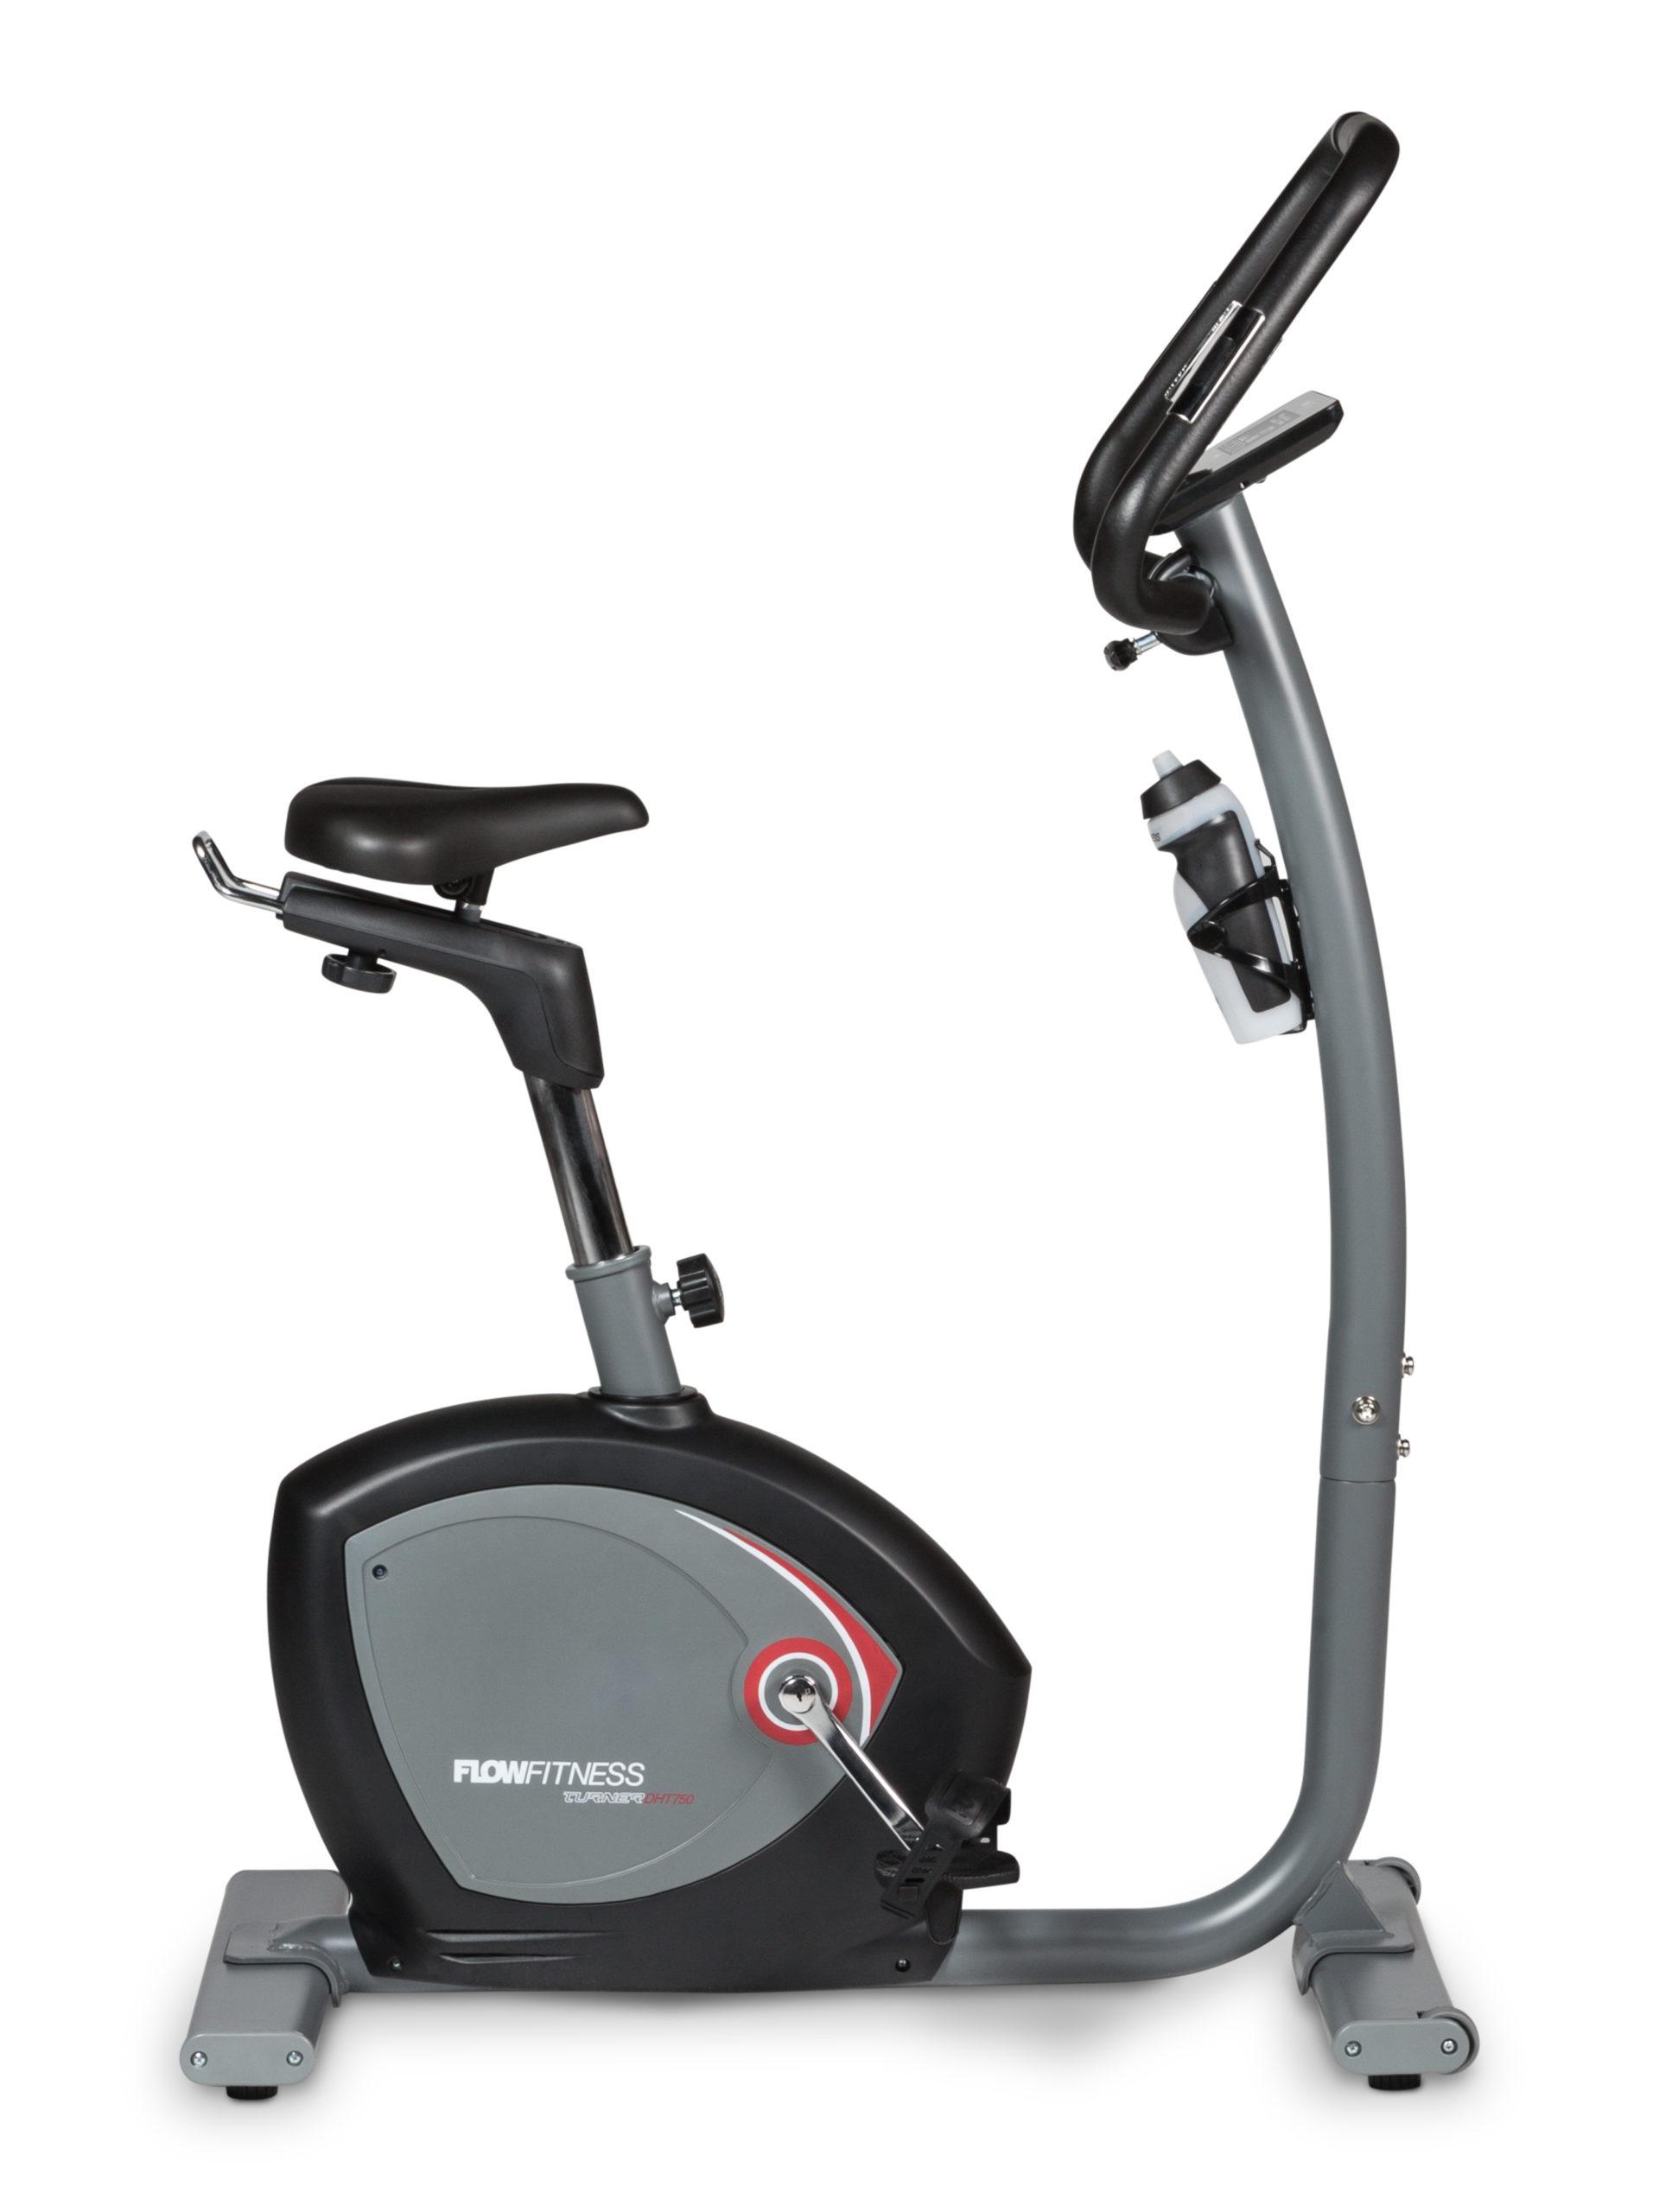 Flow Fitness Tabel Turner DHT750 Hometrainer 8